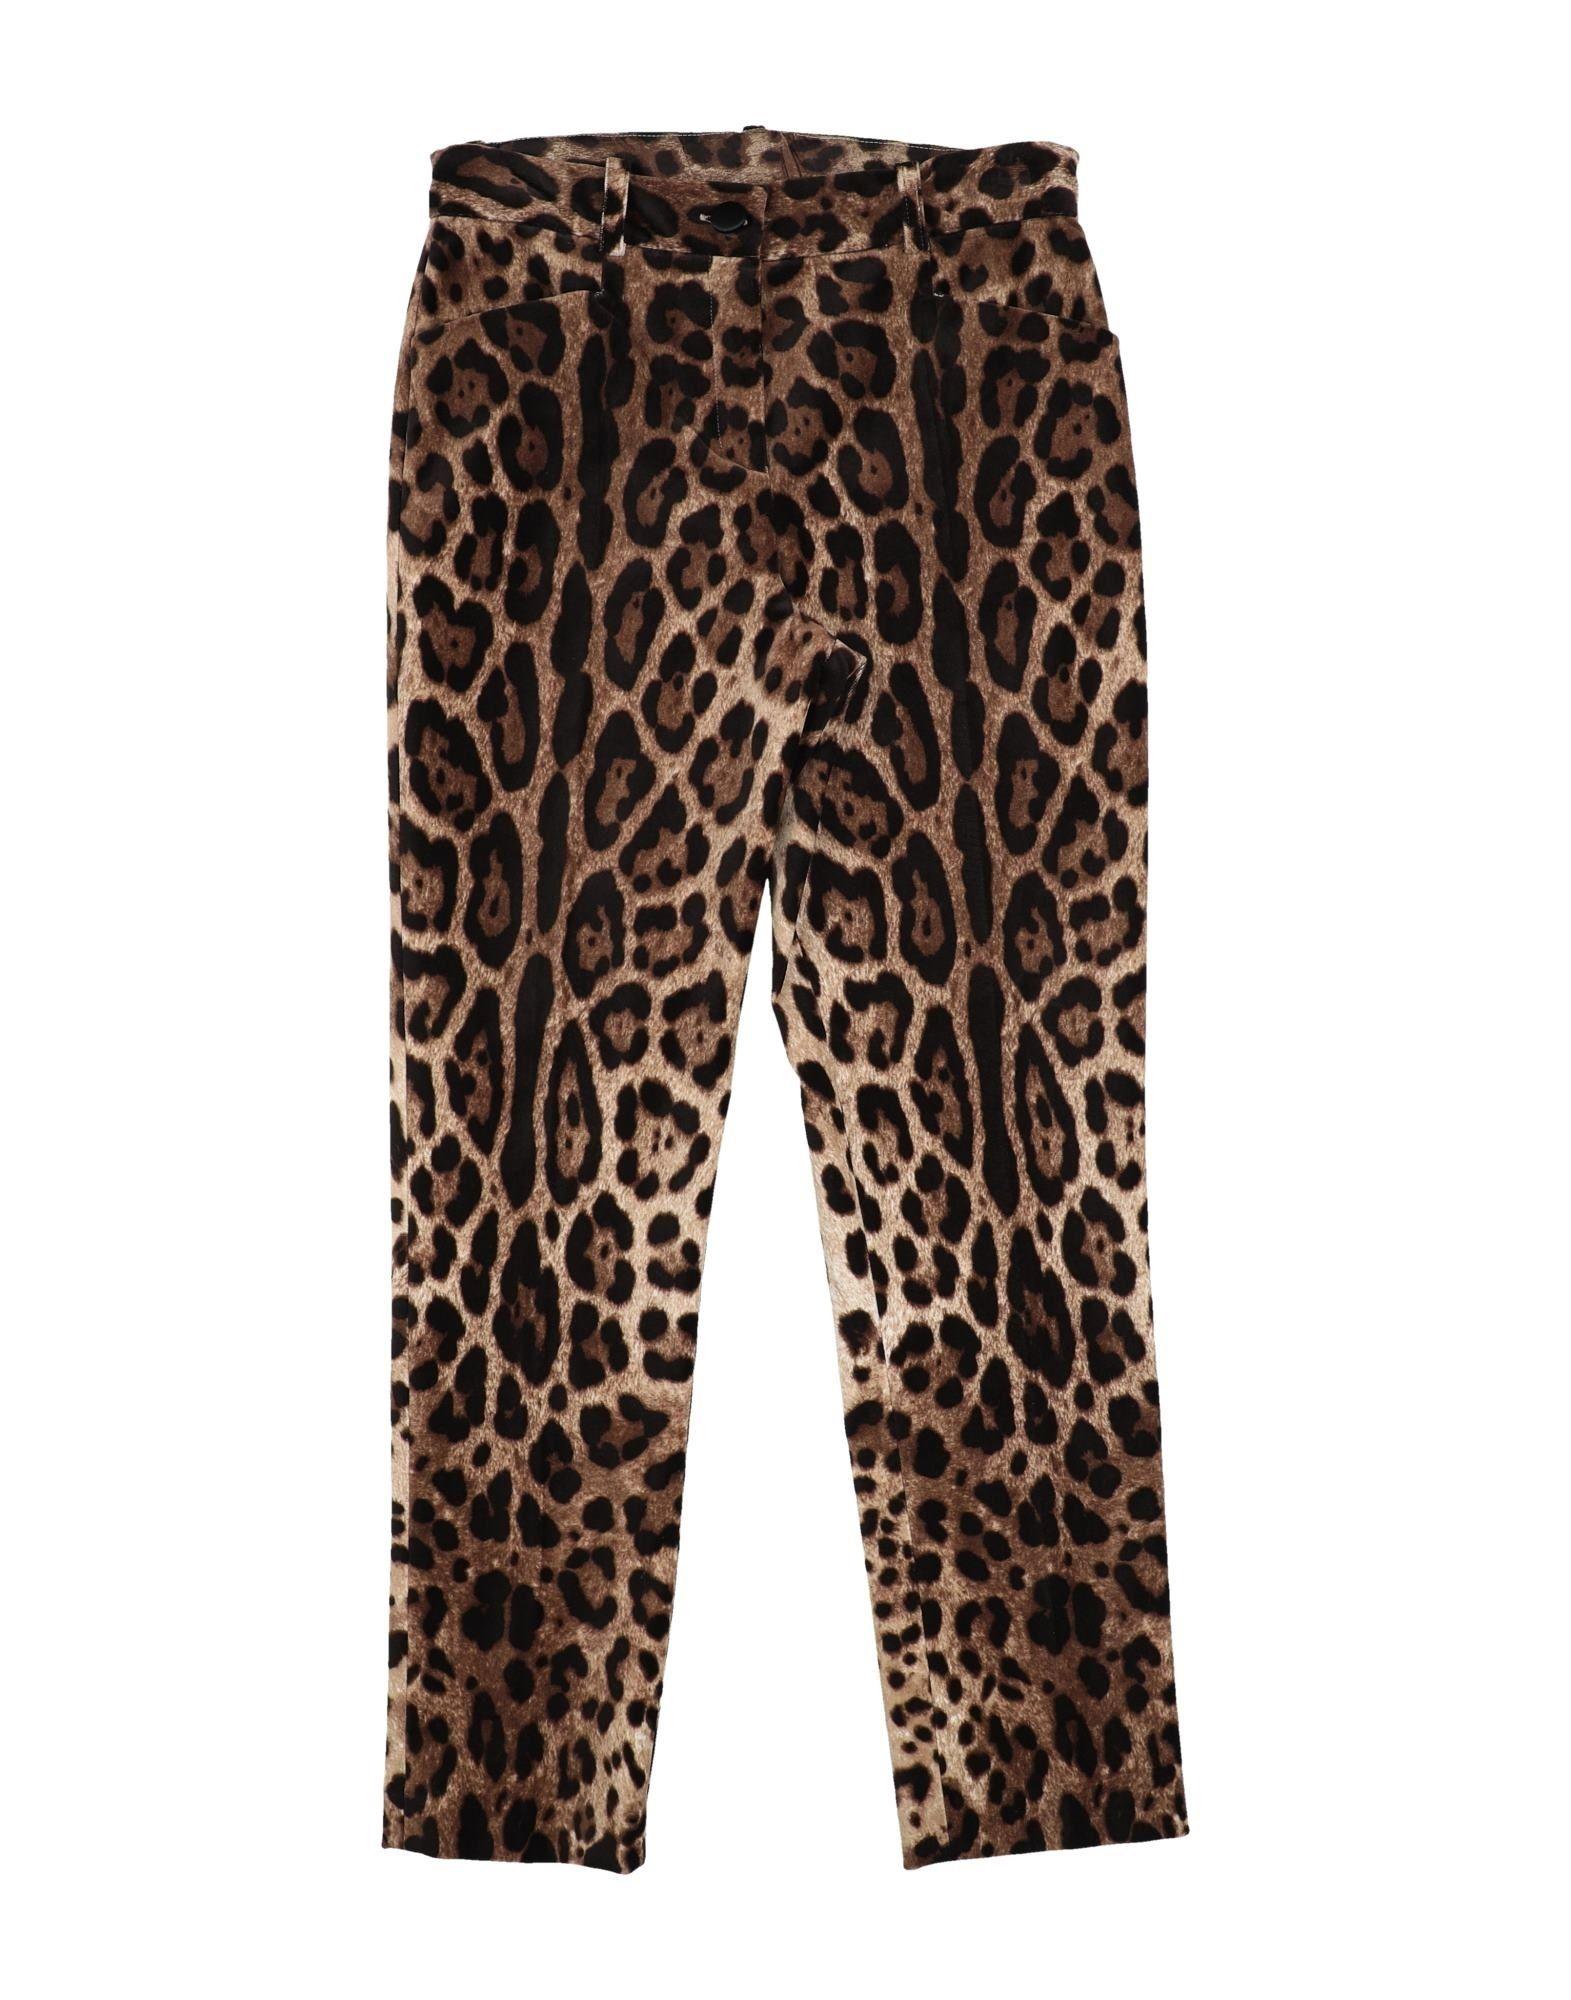 Dolce & Gabbana Kids' Casual Pants In Animal Print